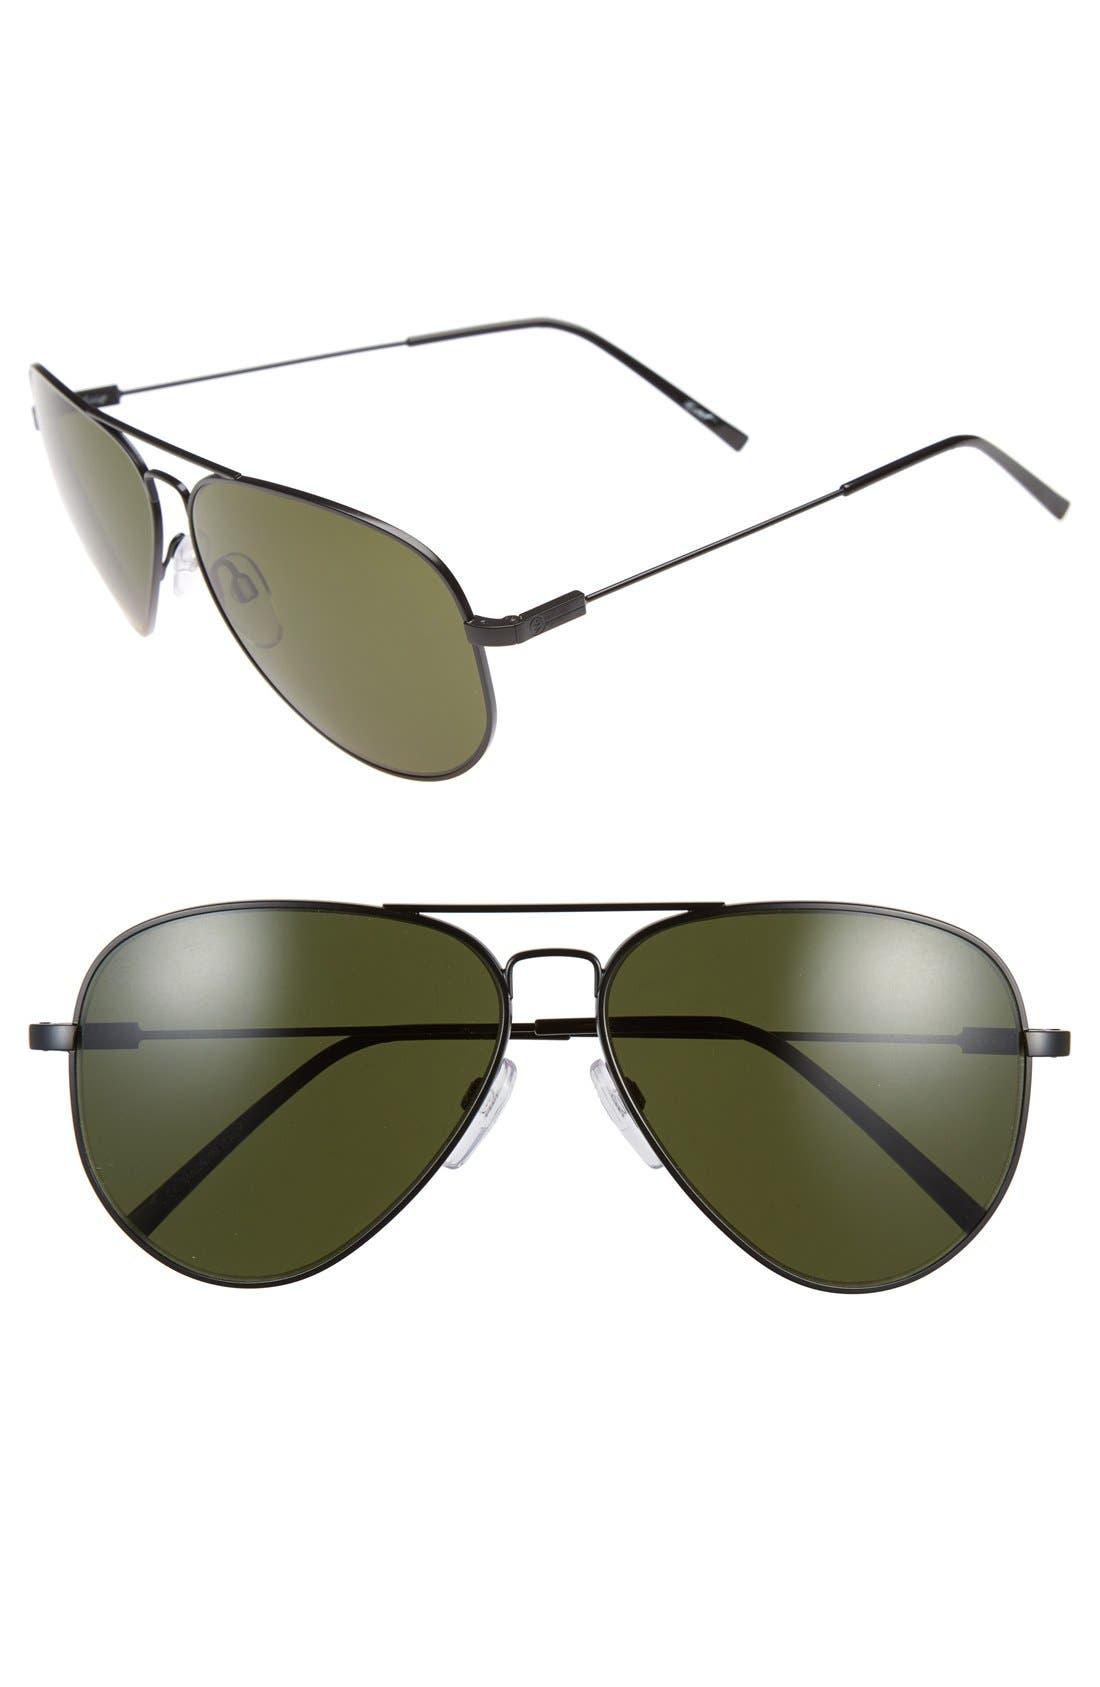 'AV1 XL' 62mm Aviator Sunglasses,                             Main thumbnail 1, color,                             Black/ Grey